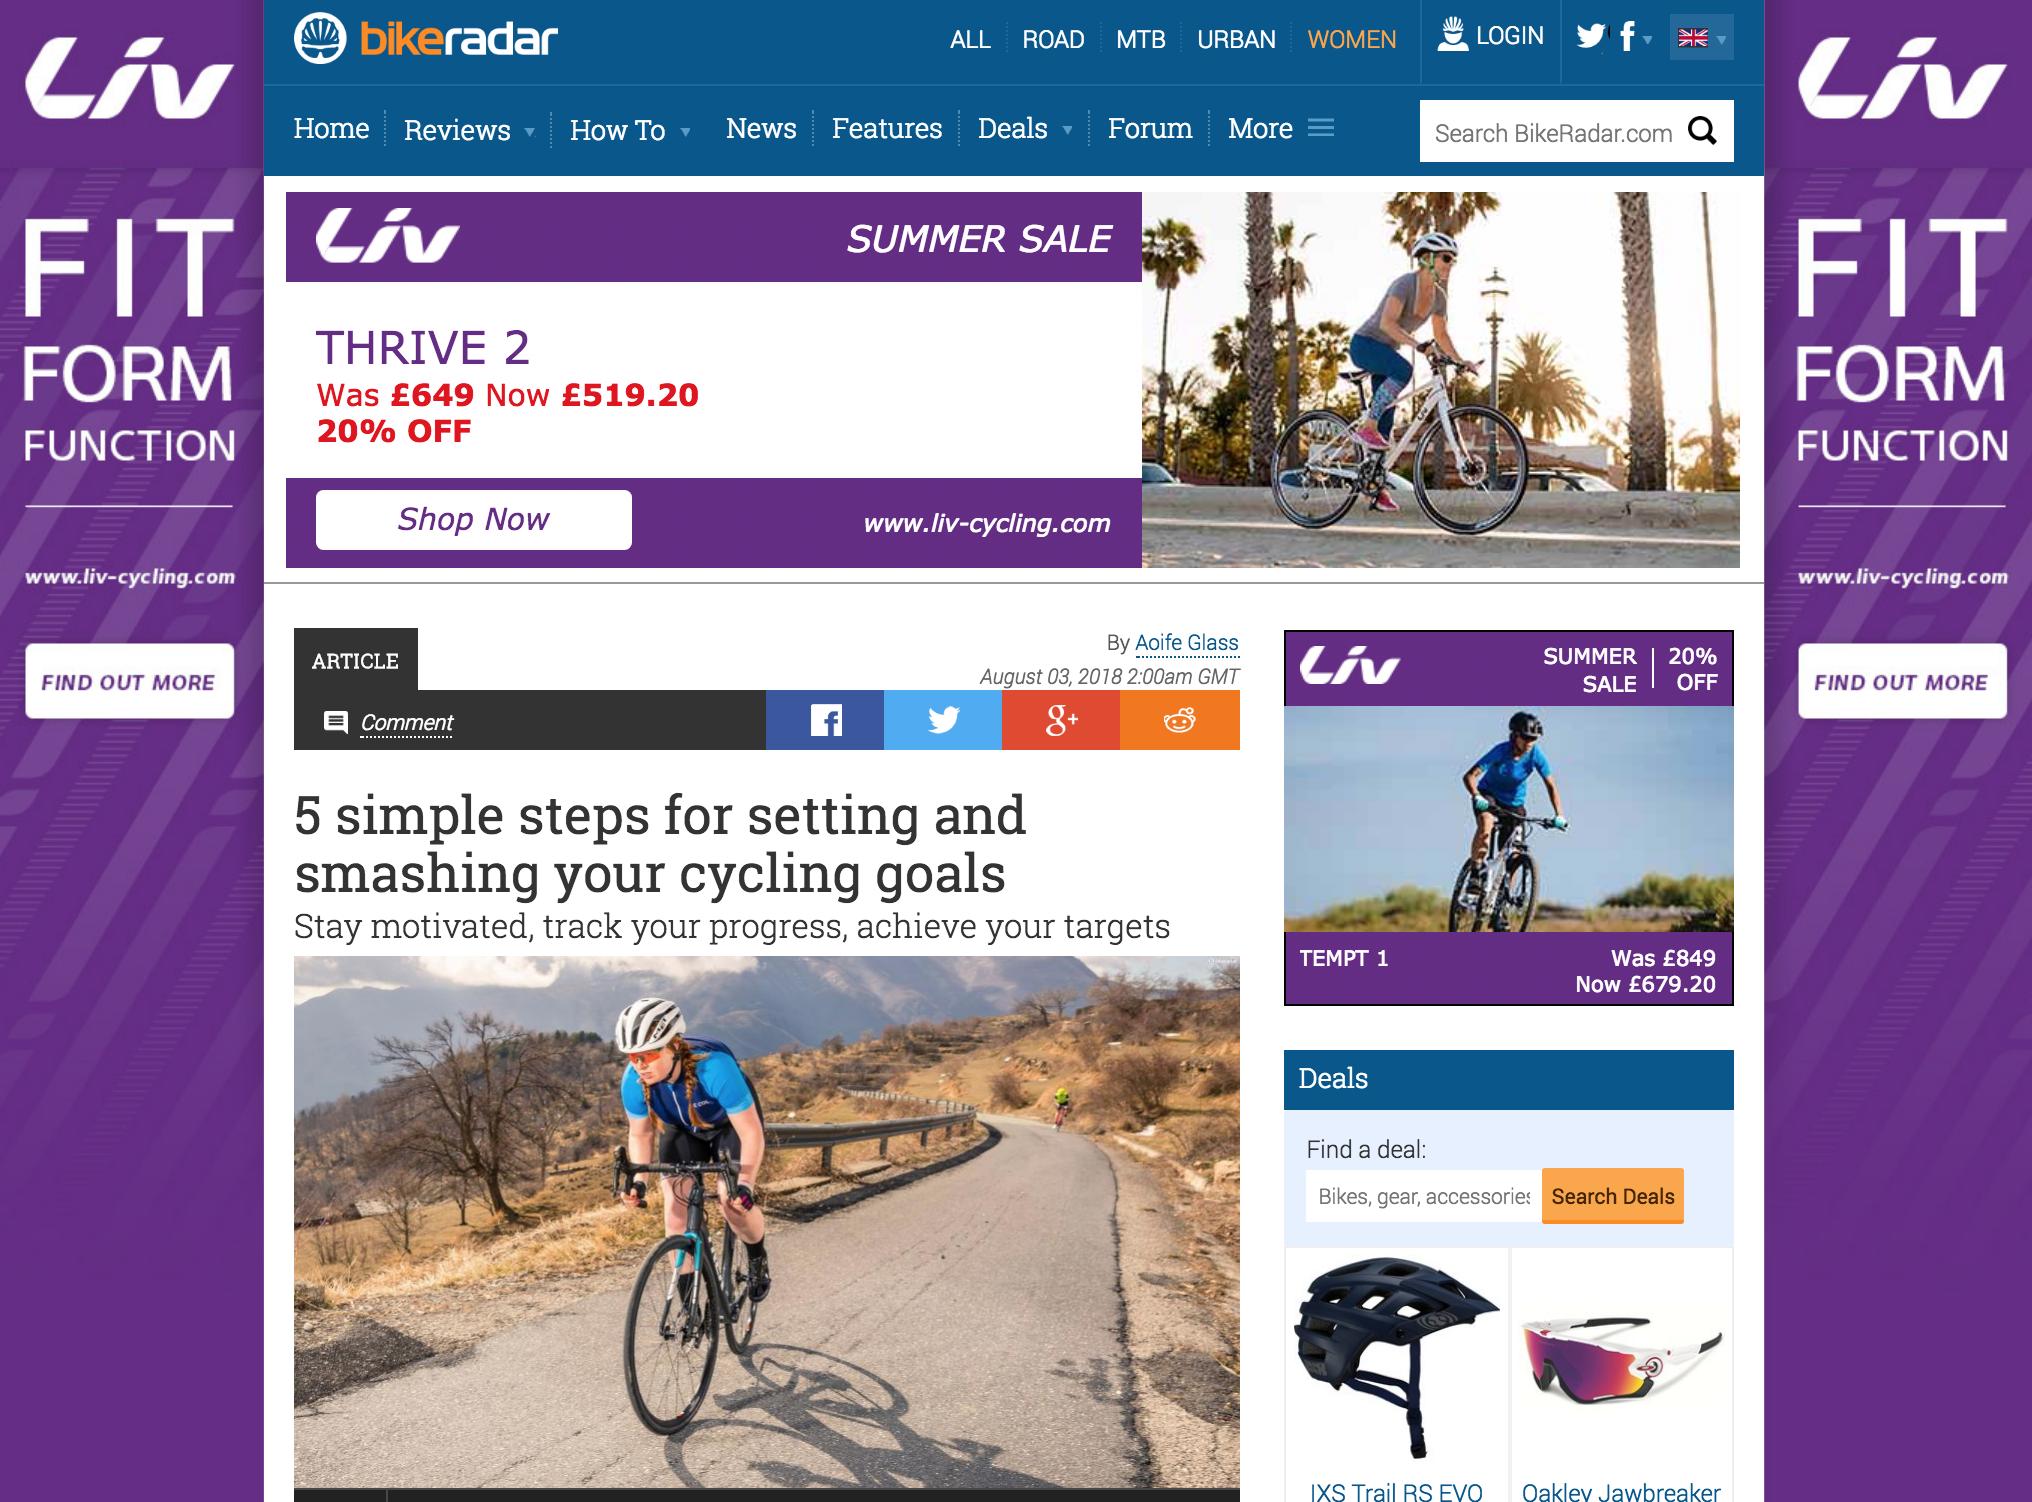 Bike Radar - Setting goals and achieving them